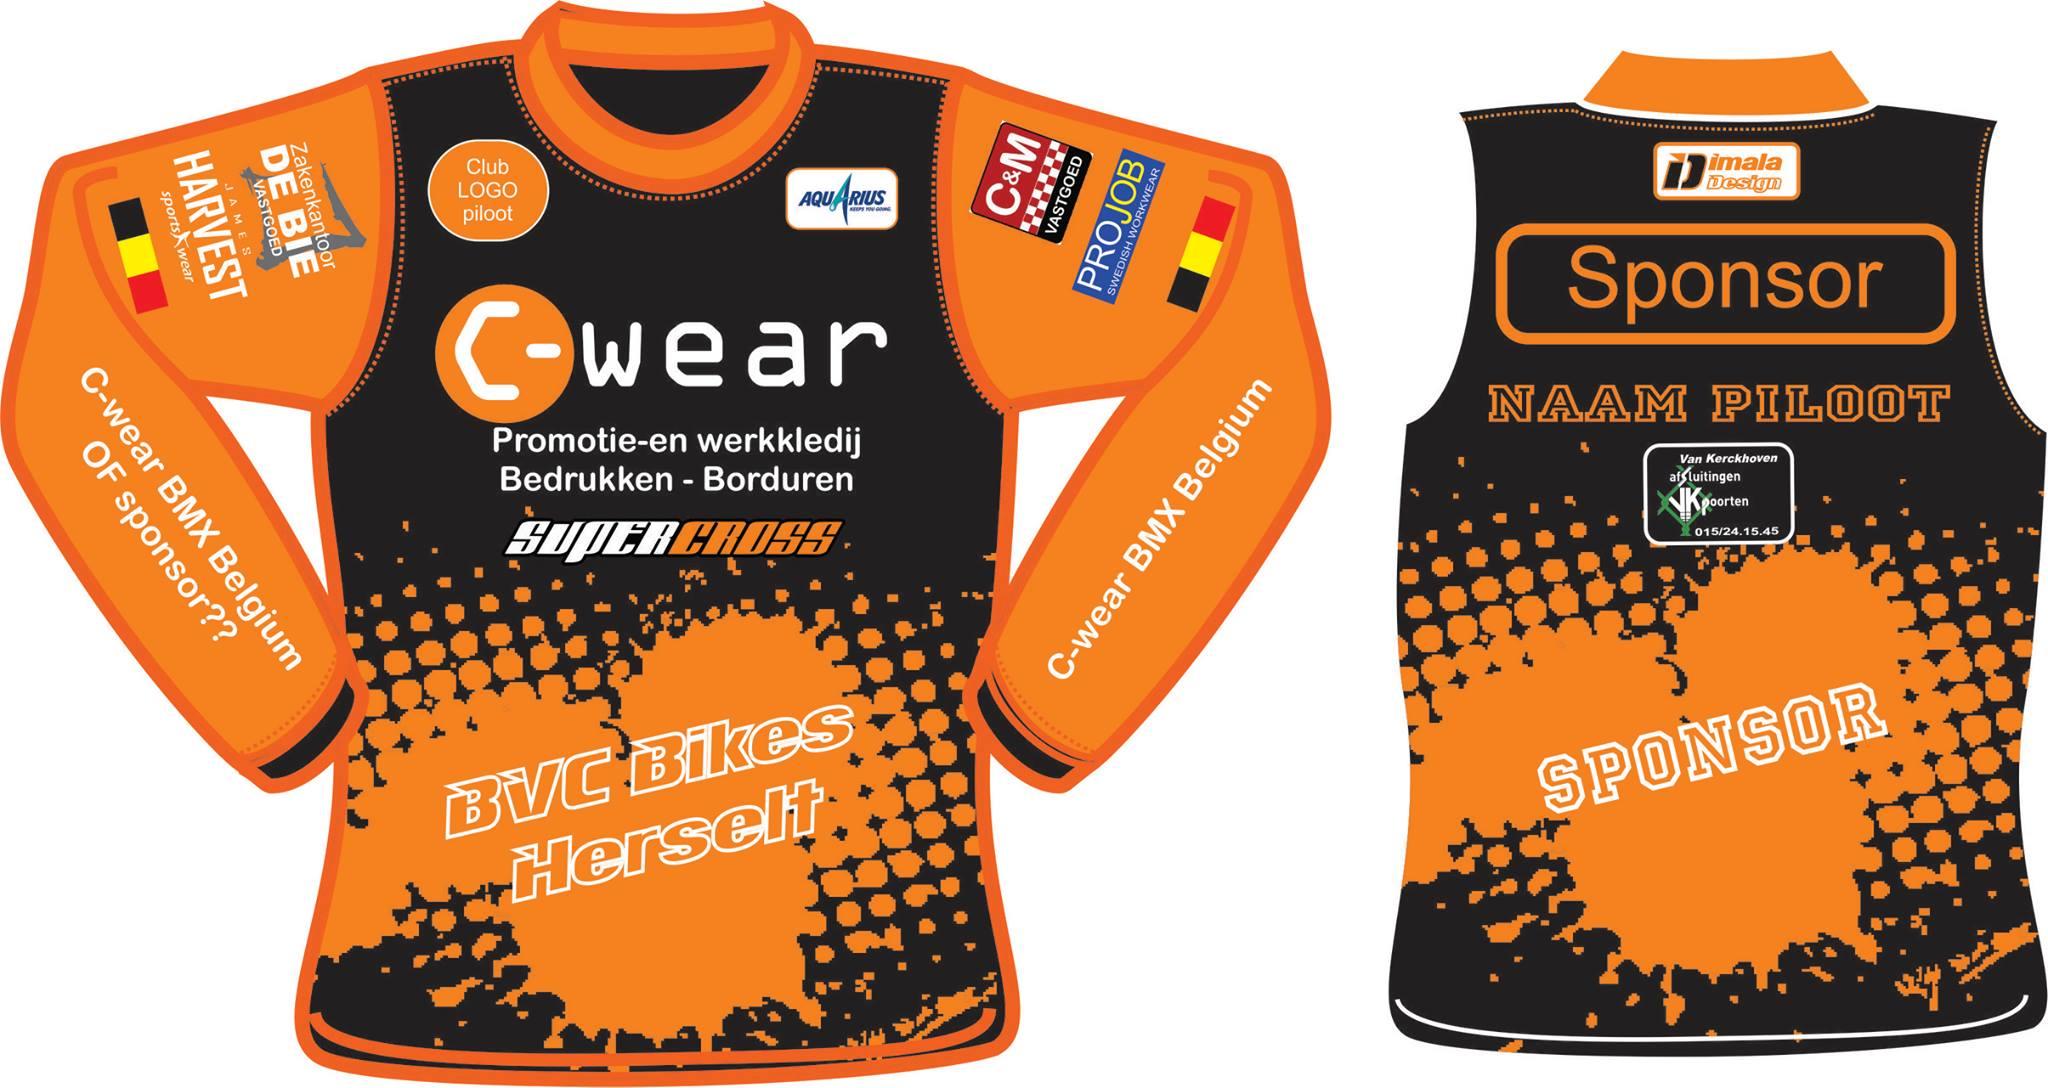 C-wear BMX Belgium 2016